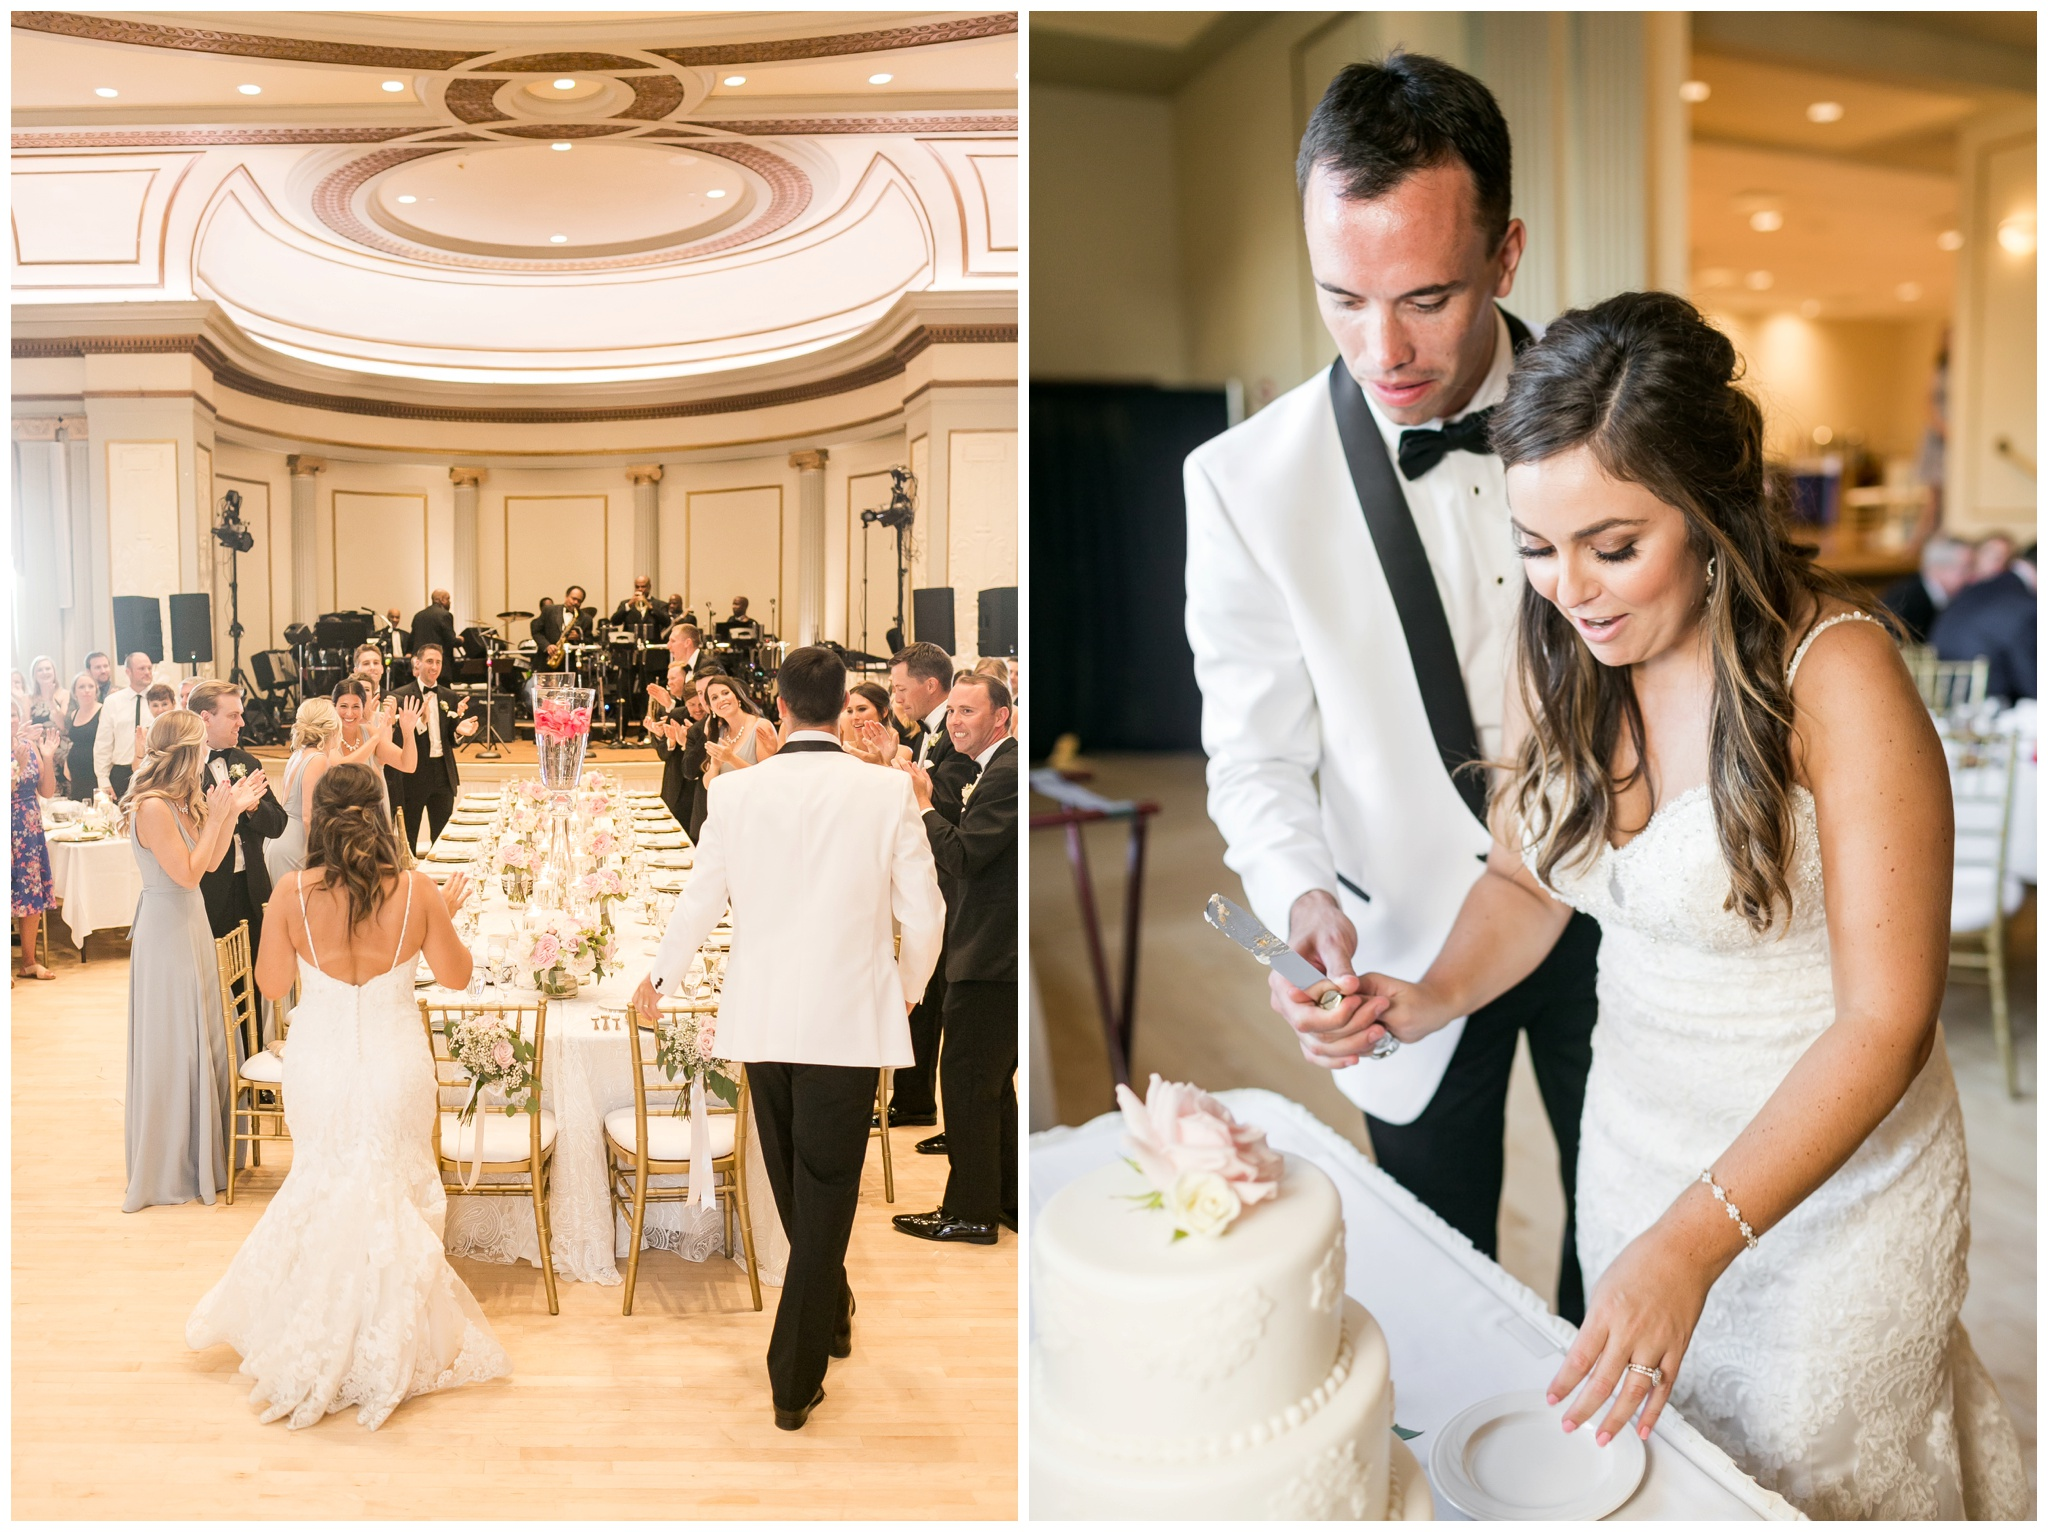 UW_Memorial_Union_wedding_madison_wisconsin_wedding_photographers_4633.jpg